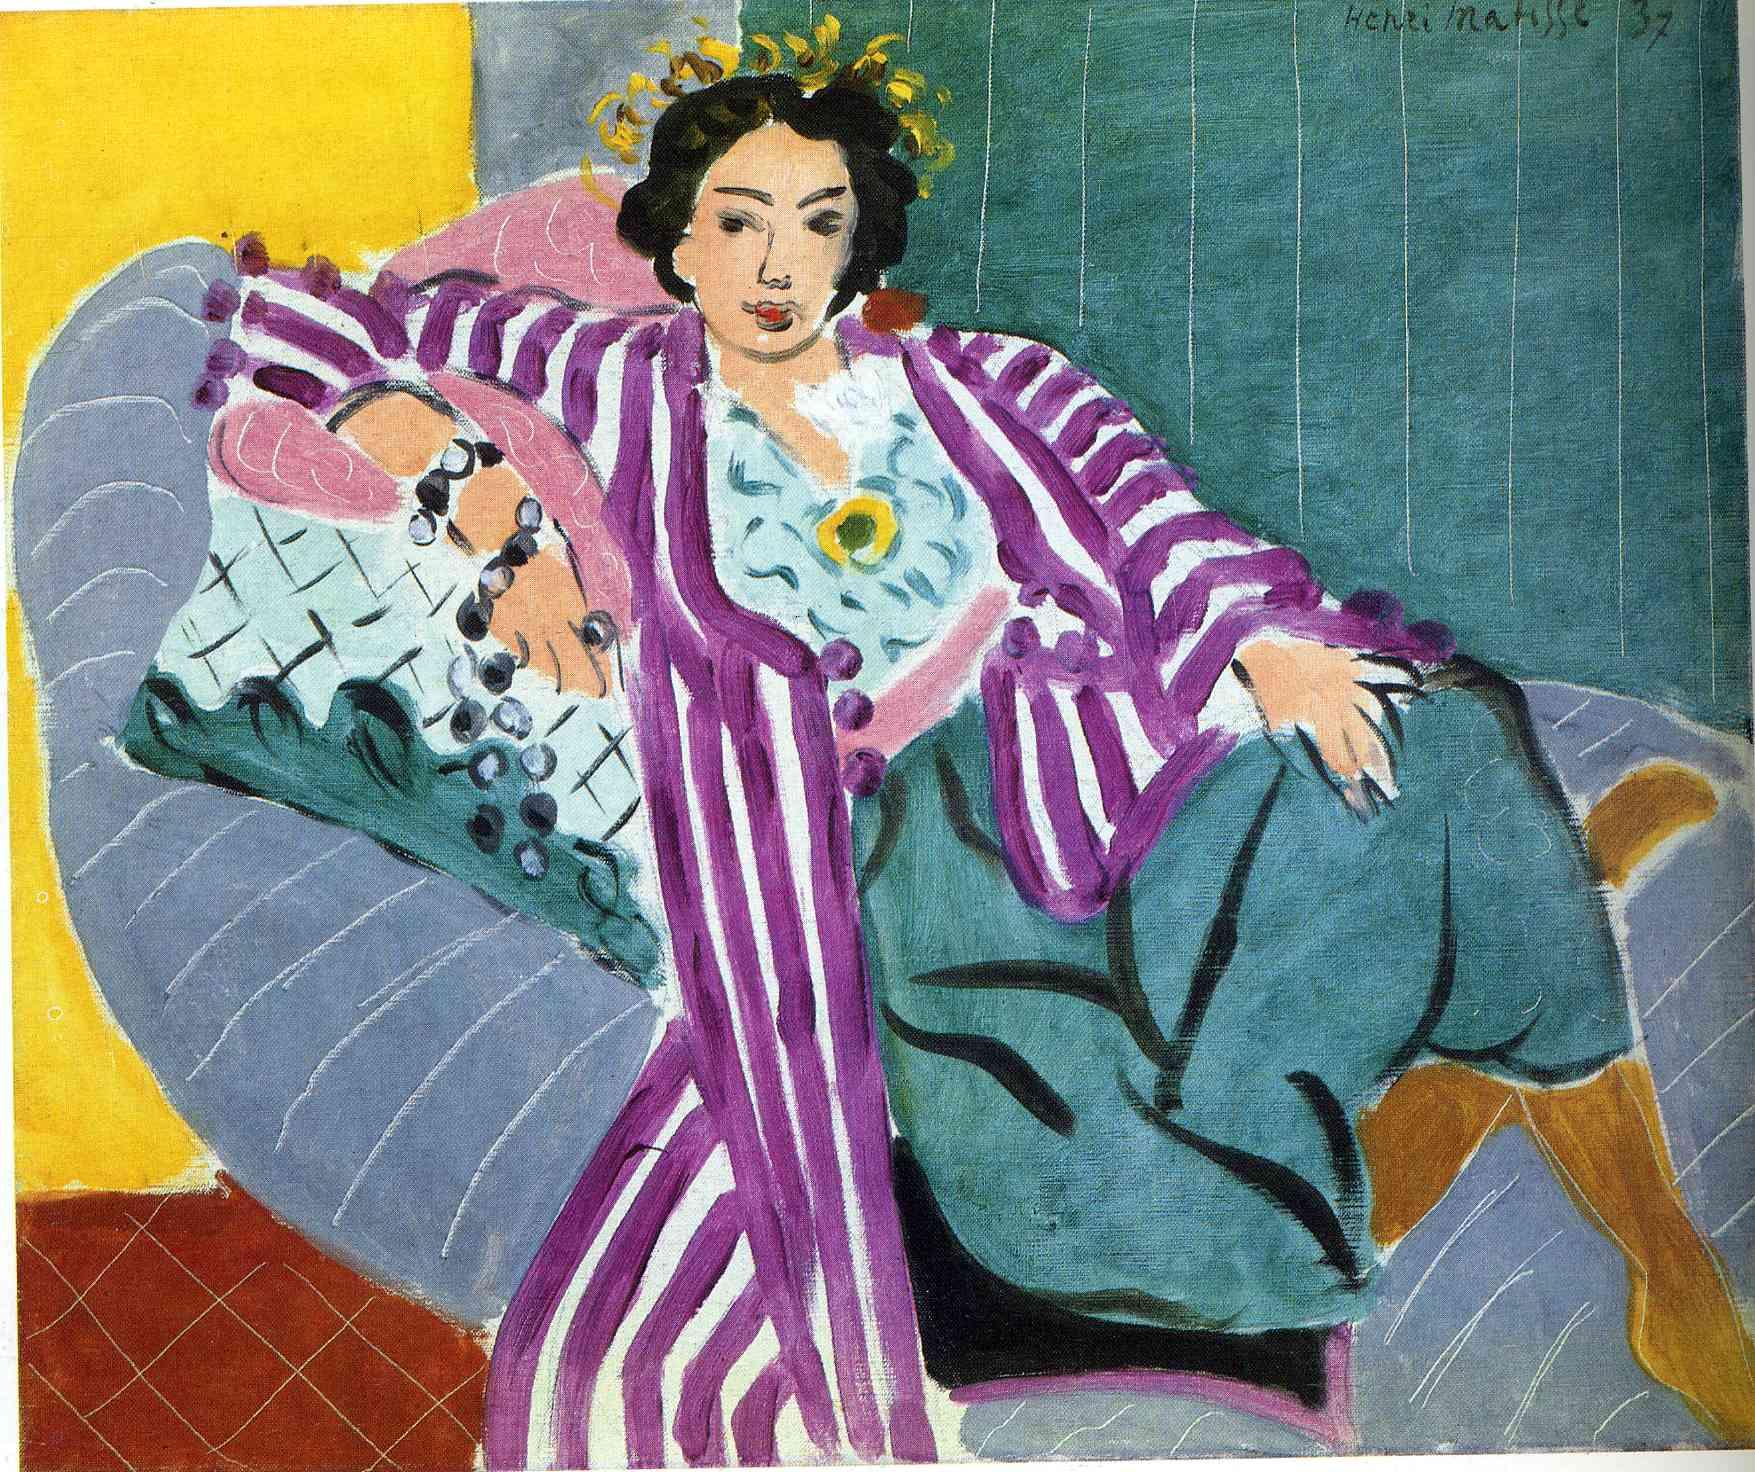 Small Odalisque in Purple Robe, 1937 - Henri Matisse - WikiArt.org